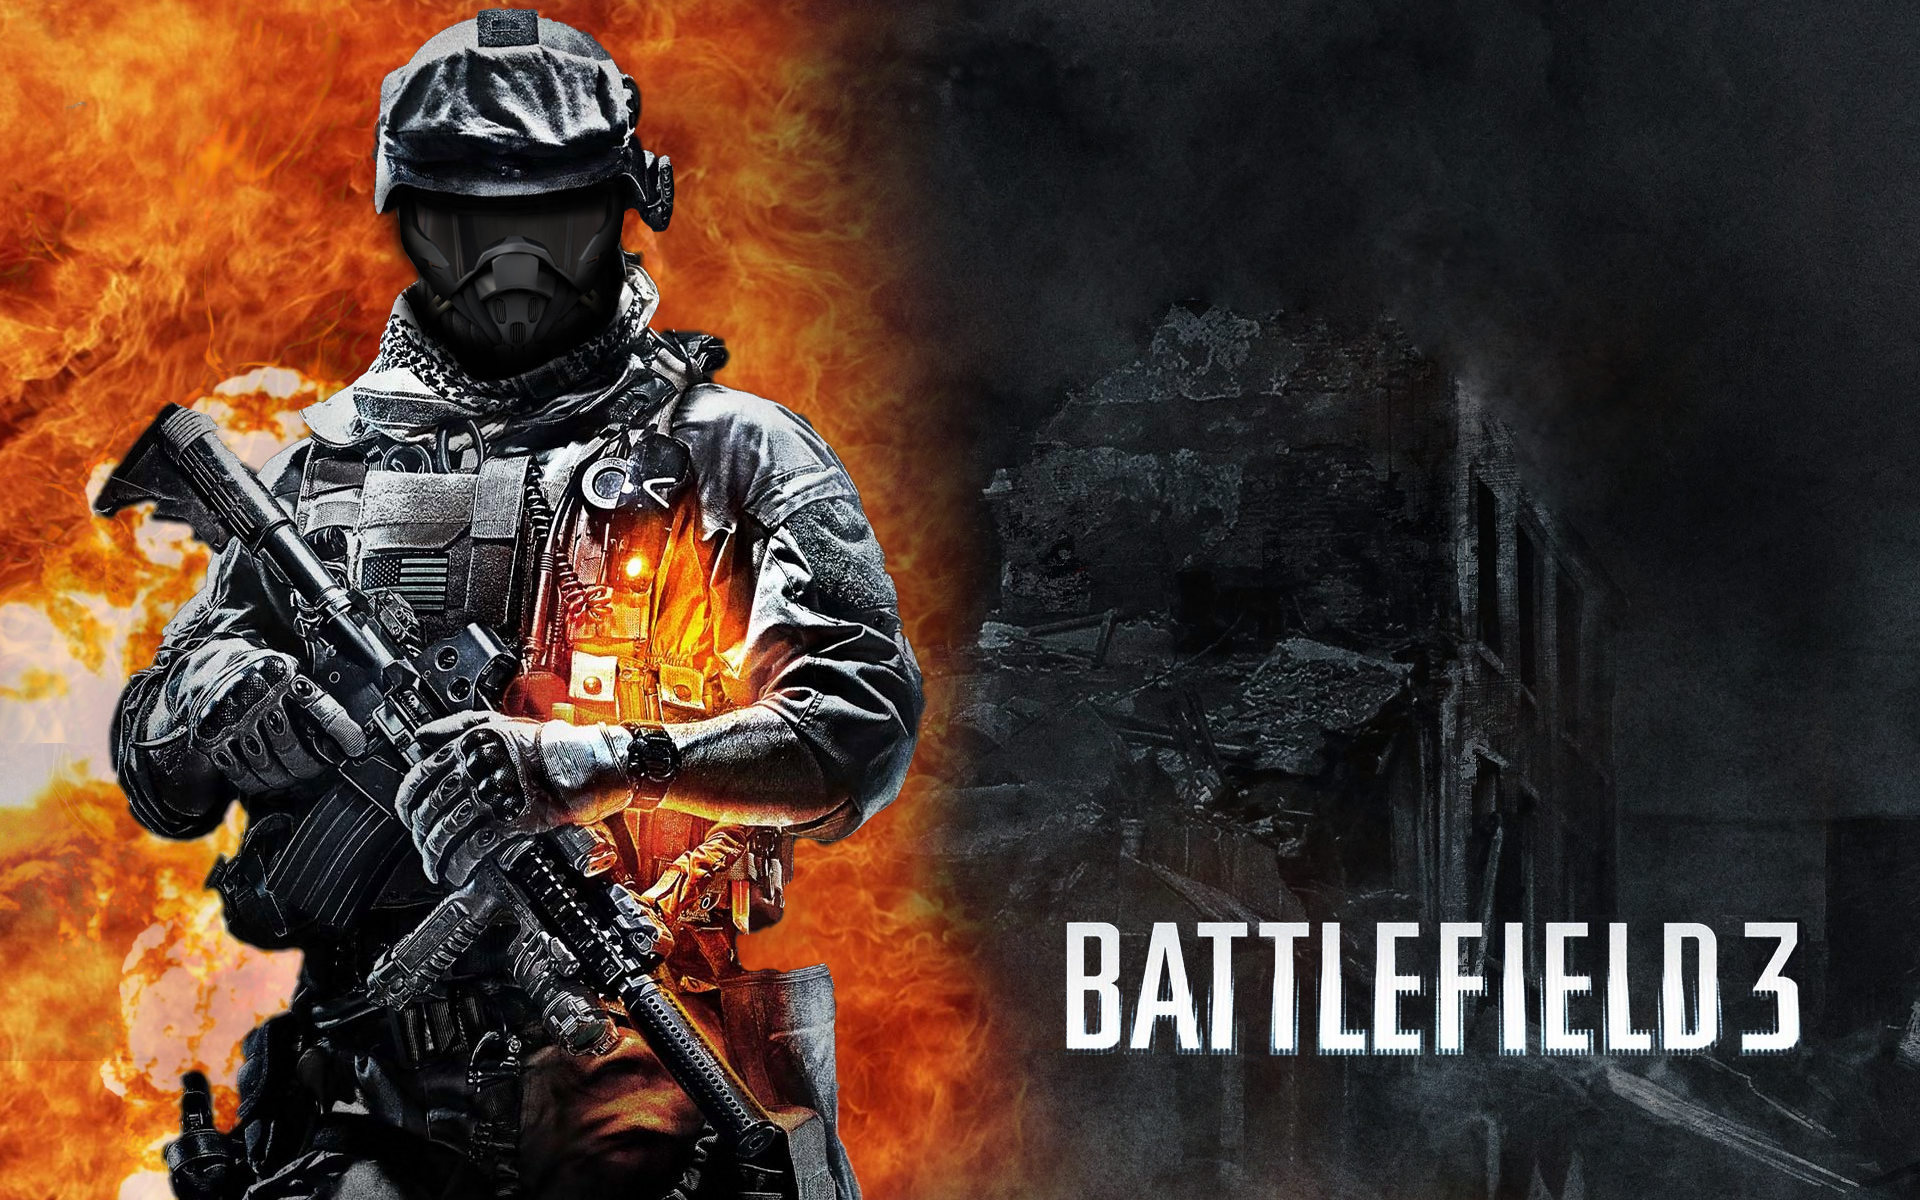 Videogioco - Battlefield 3 - Battlefield - Flames - Gun Sfondi